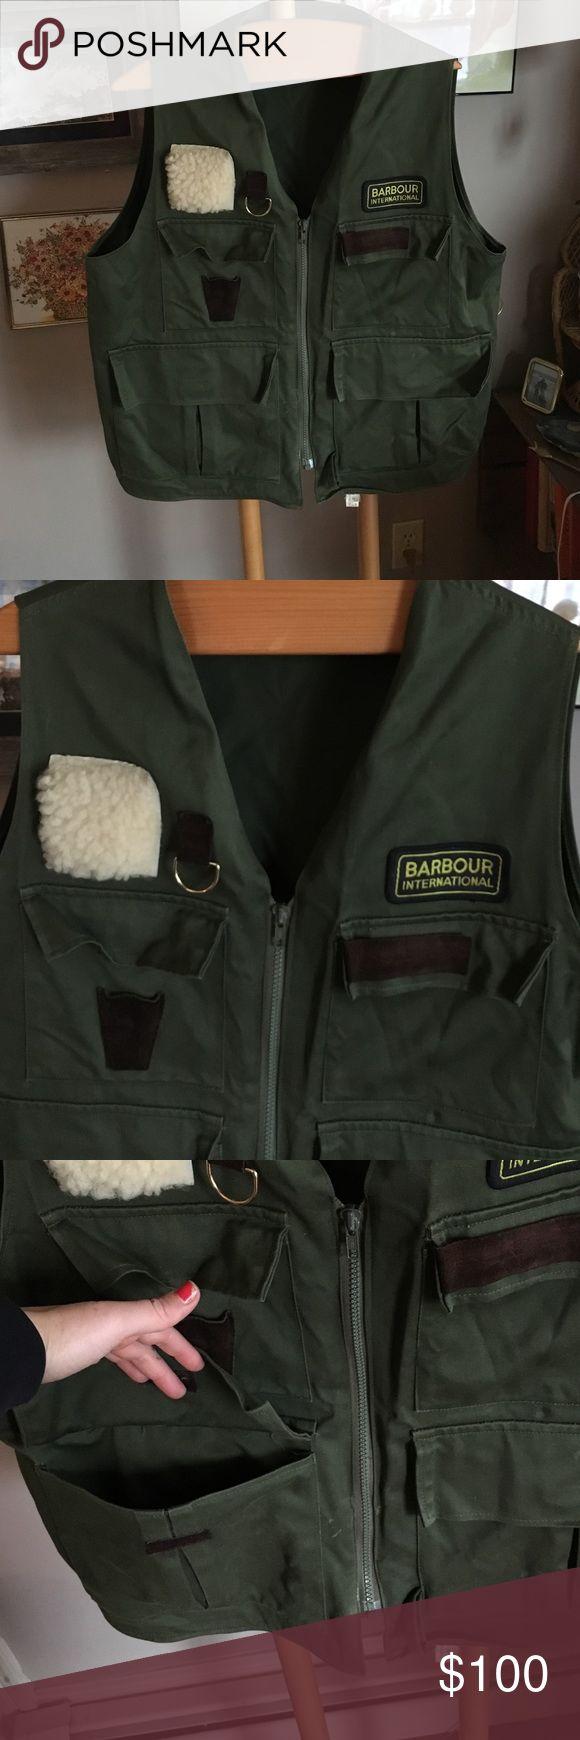 Barbour vest Epic vintage Barbour fly fishing vest! This beat is great for adventures! Lots of pockets! Barbour Jackets & Coats Vests